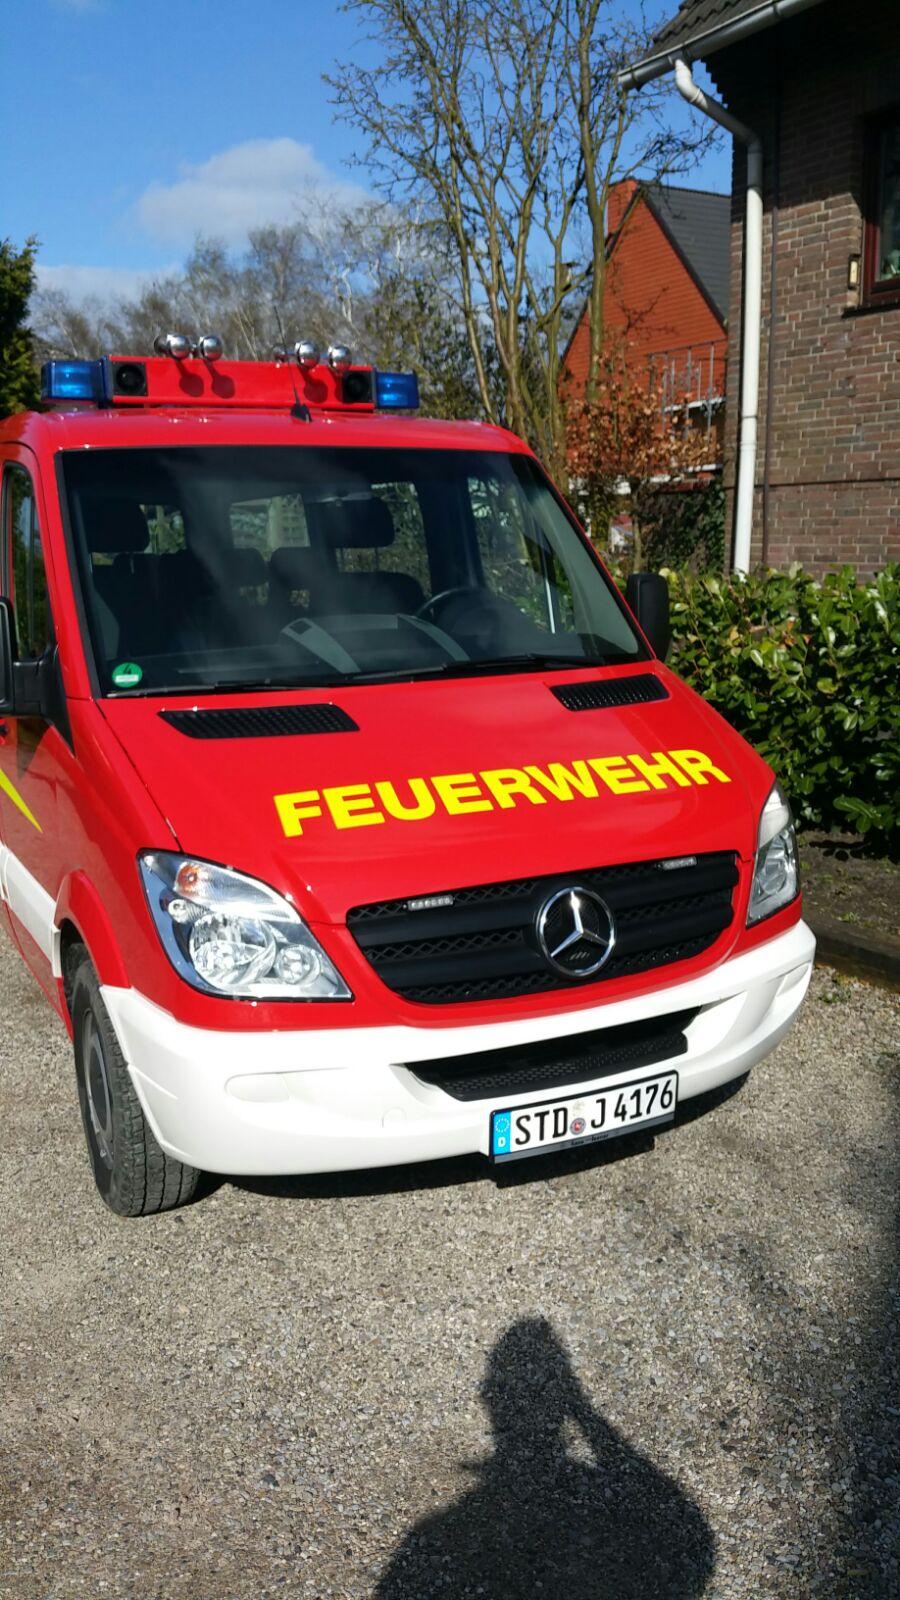 http://feuerwehr-buxtehude.de/media/img/bilder_ow_im/bilder_im_fa/mtf/4176c.jpg